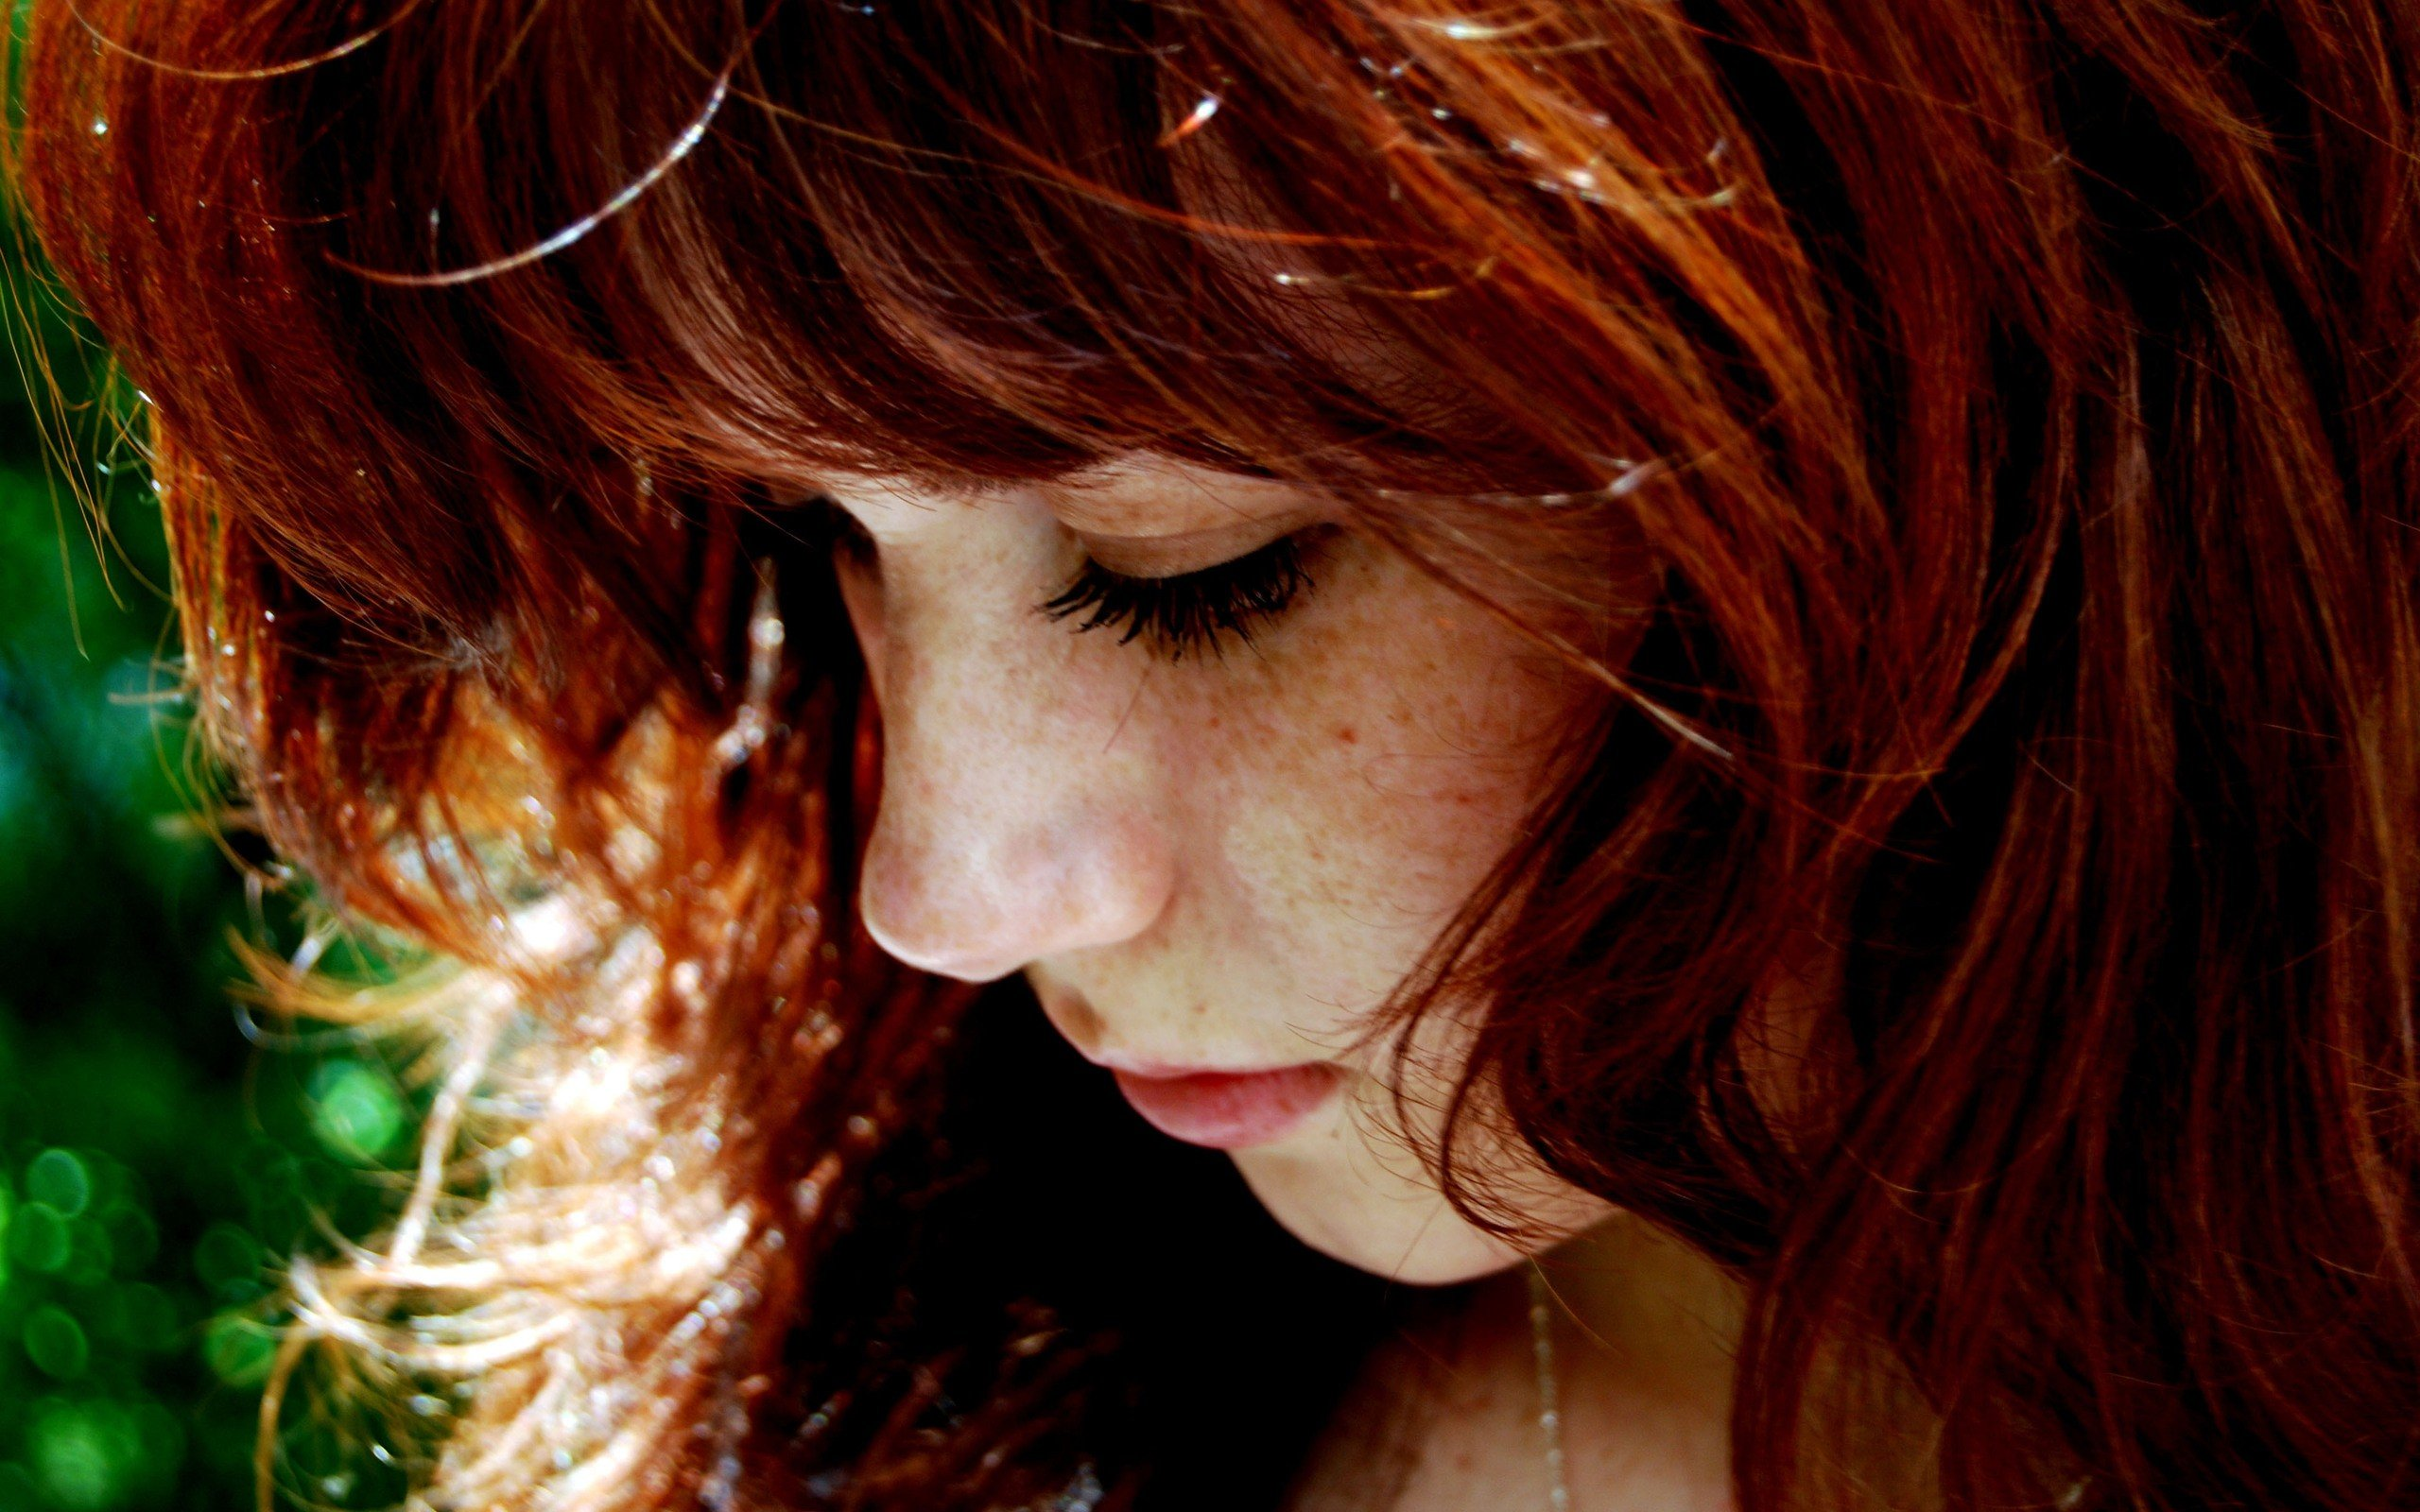 women, Face, Redhead, Freckles, Closeup Wallpaper